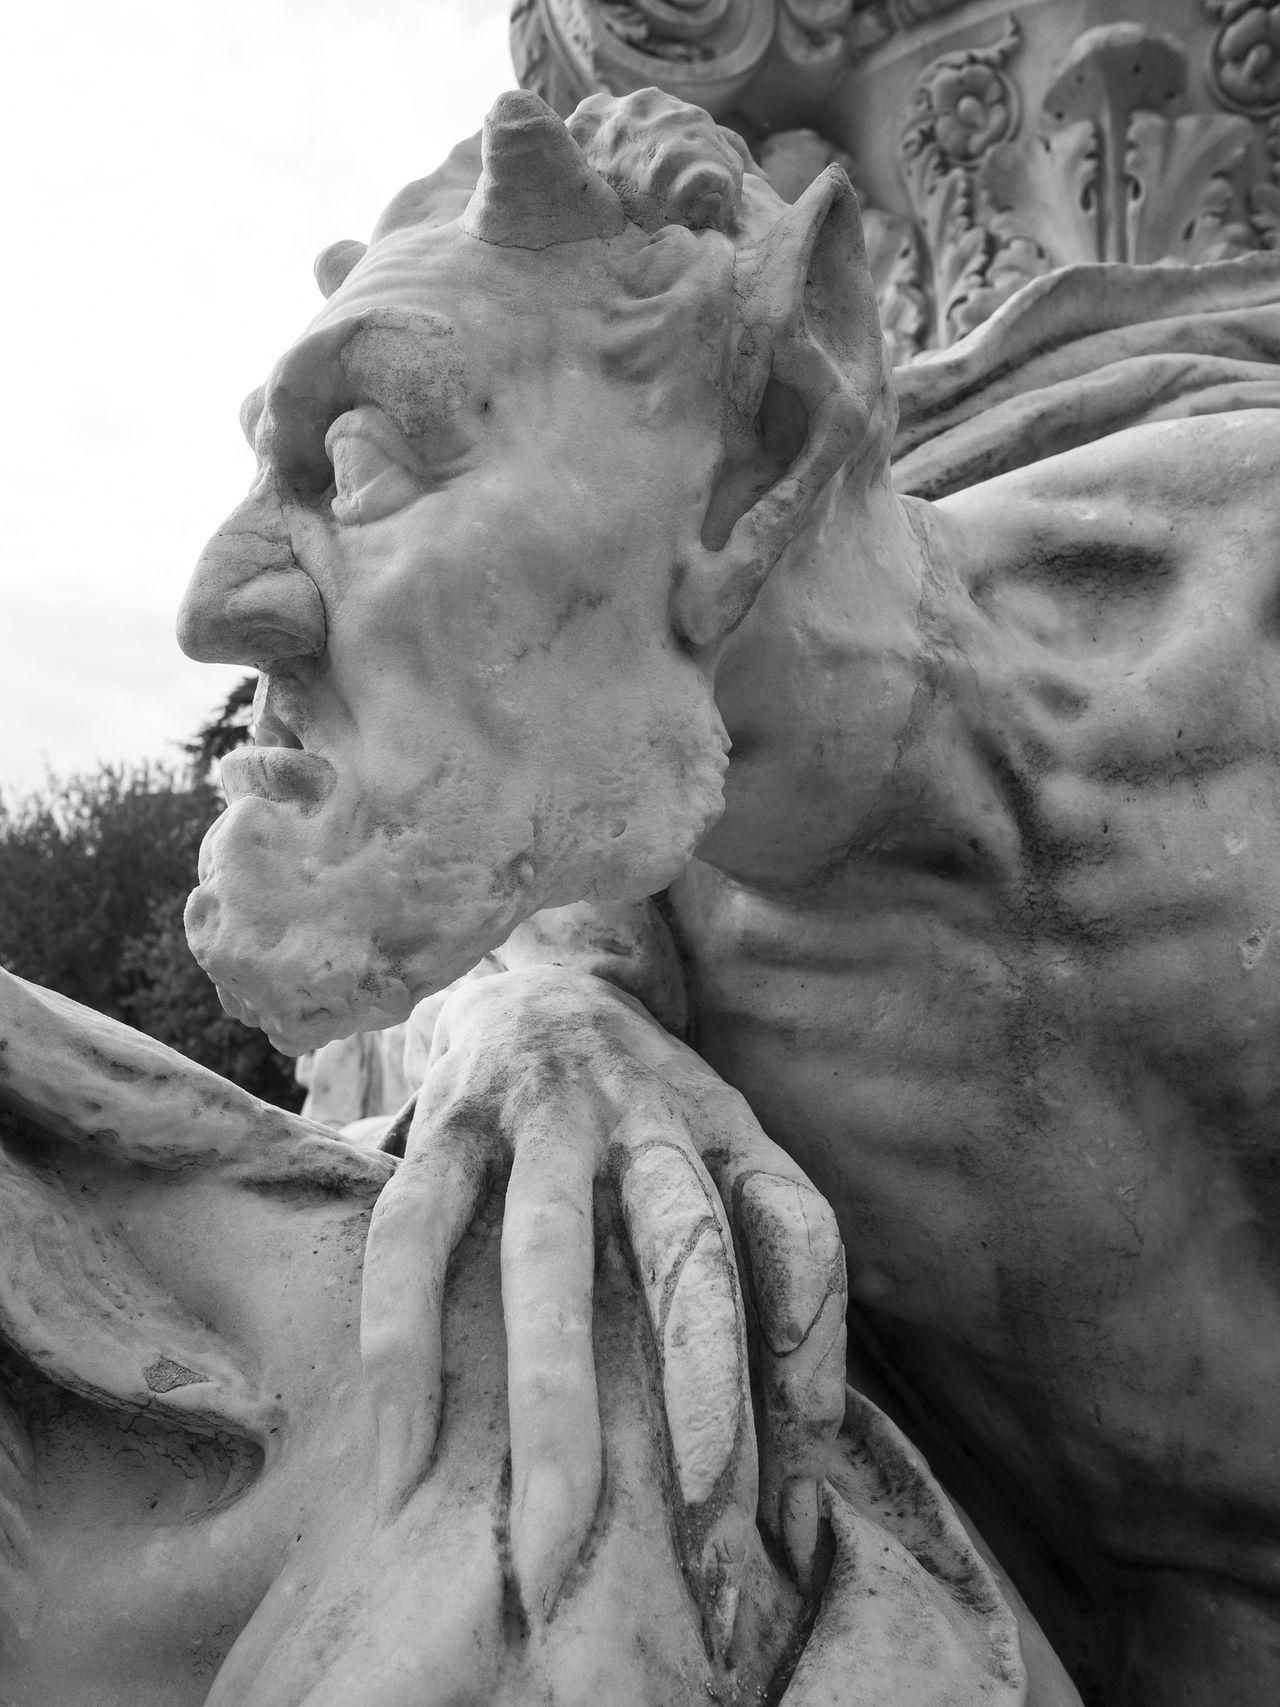 Goethe Mefistofeles Rome Rome Italy Scuplture Statue Villa Borghese